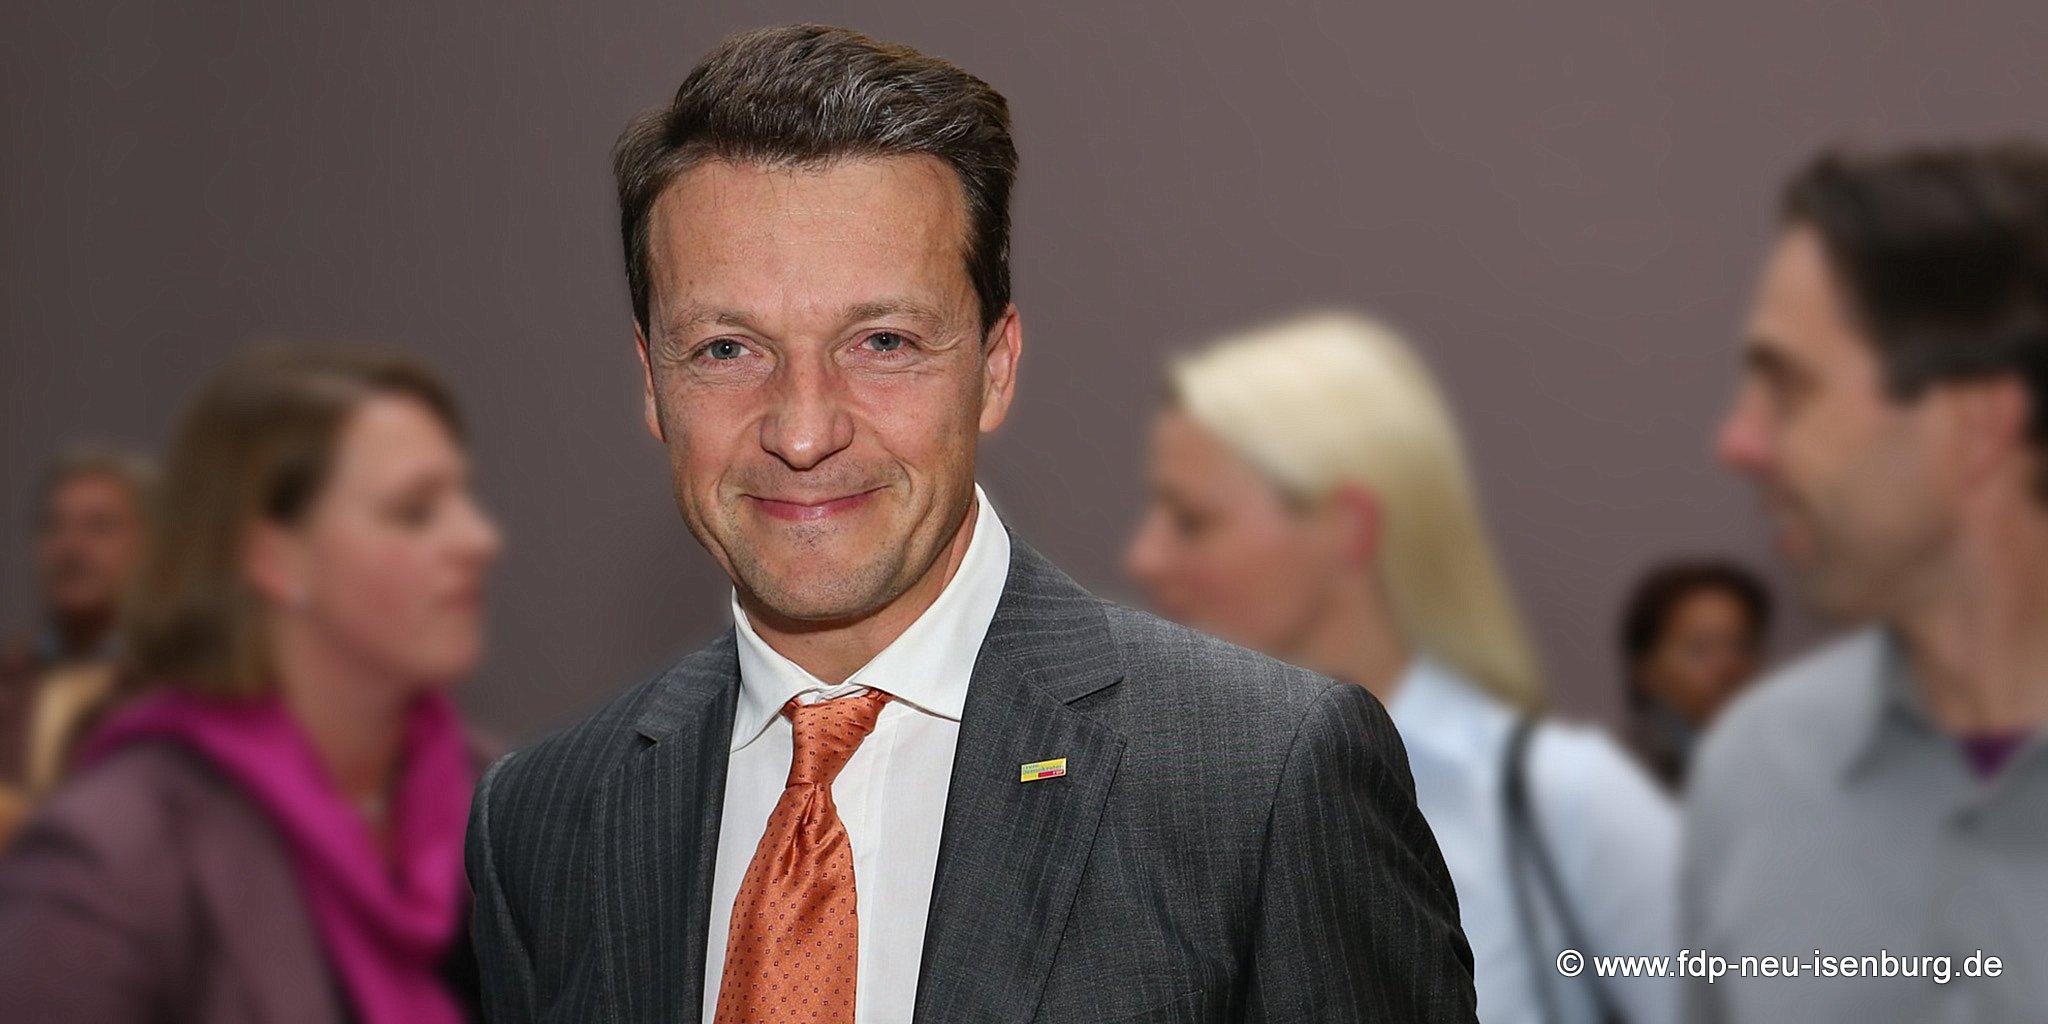 Jörg Müller, stellv. Fraktionsvorsitzender der FDP Neu-Isenburg